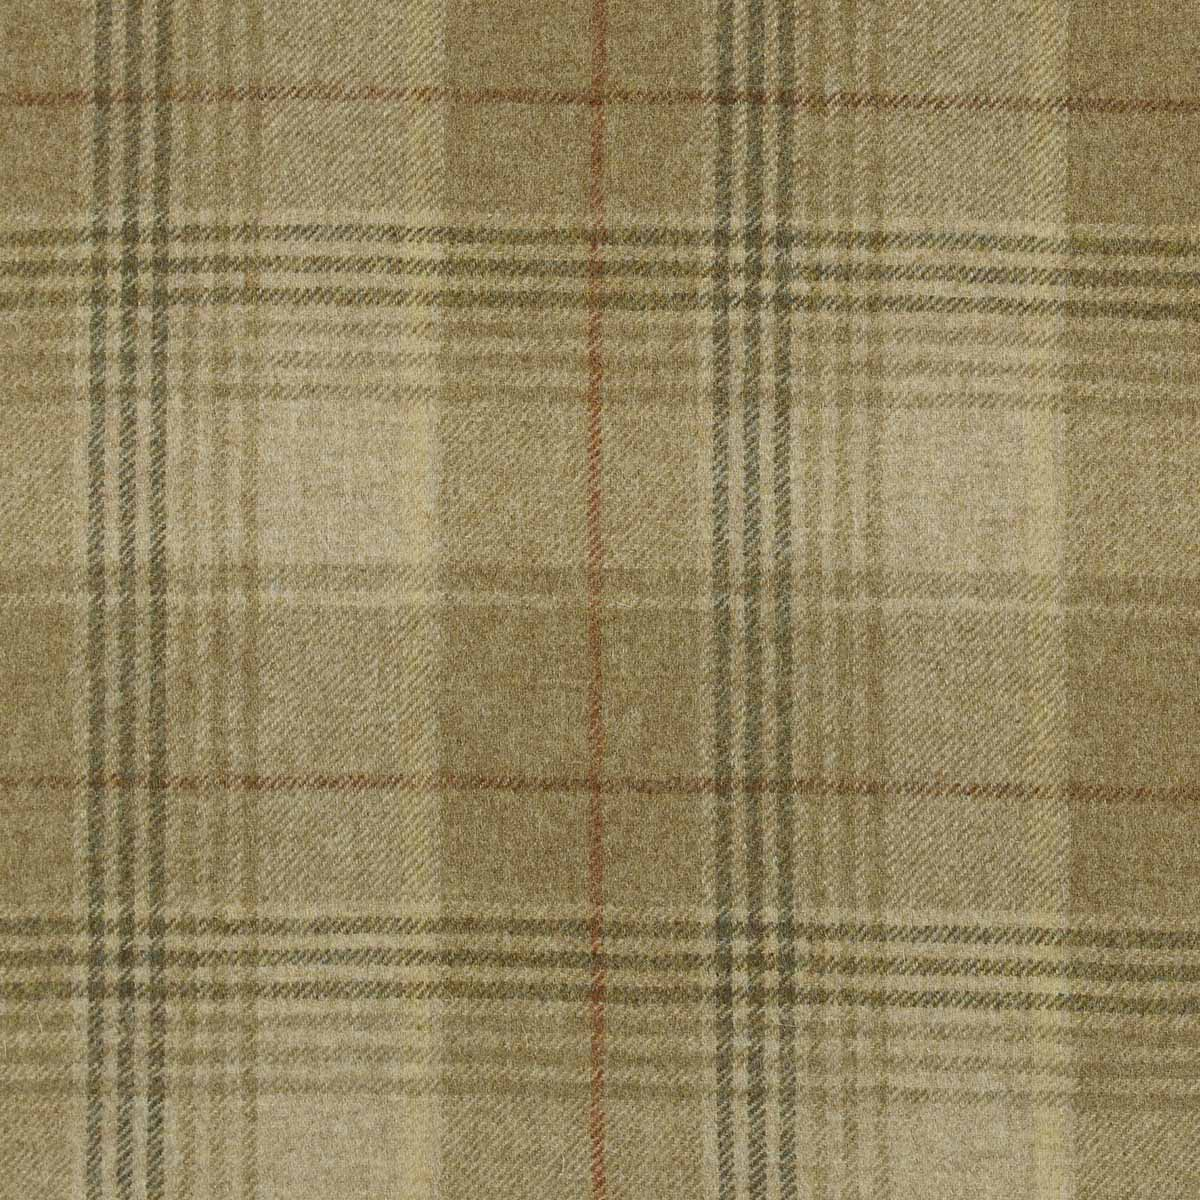 Huntingtower sand fabric baronial abraham moon for Moon pattern fabric